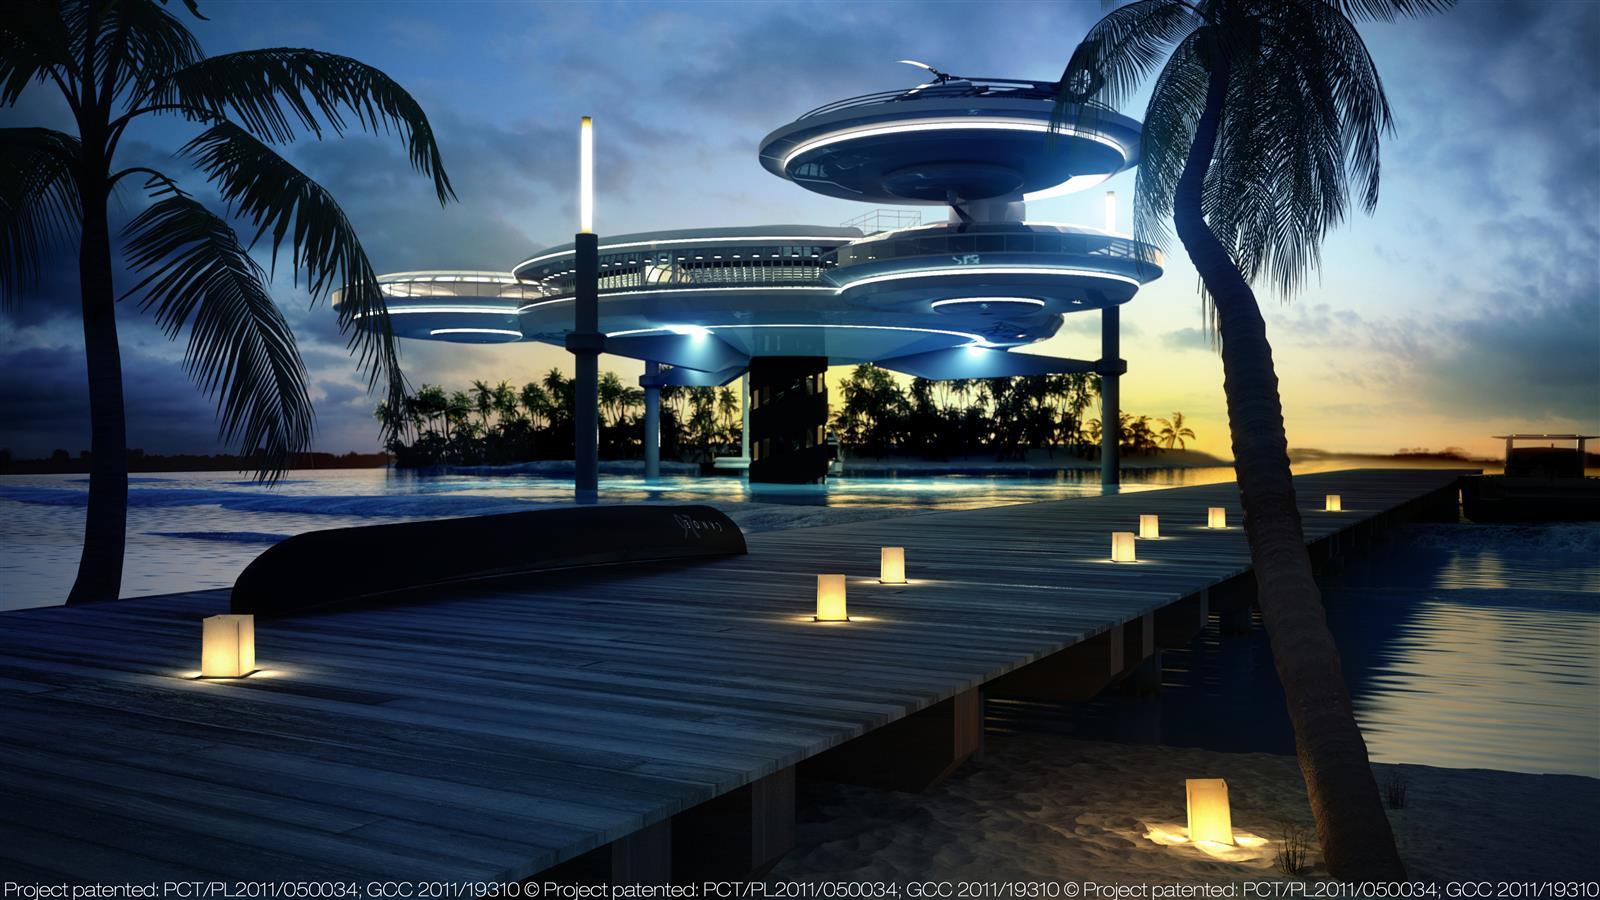 Water Discus Underwater Hotels In Dubai (6)